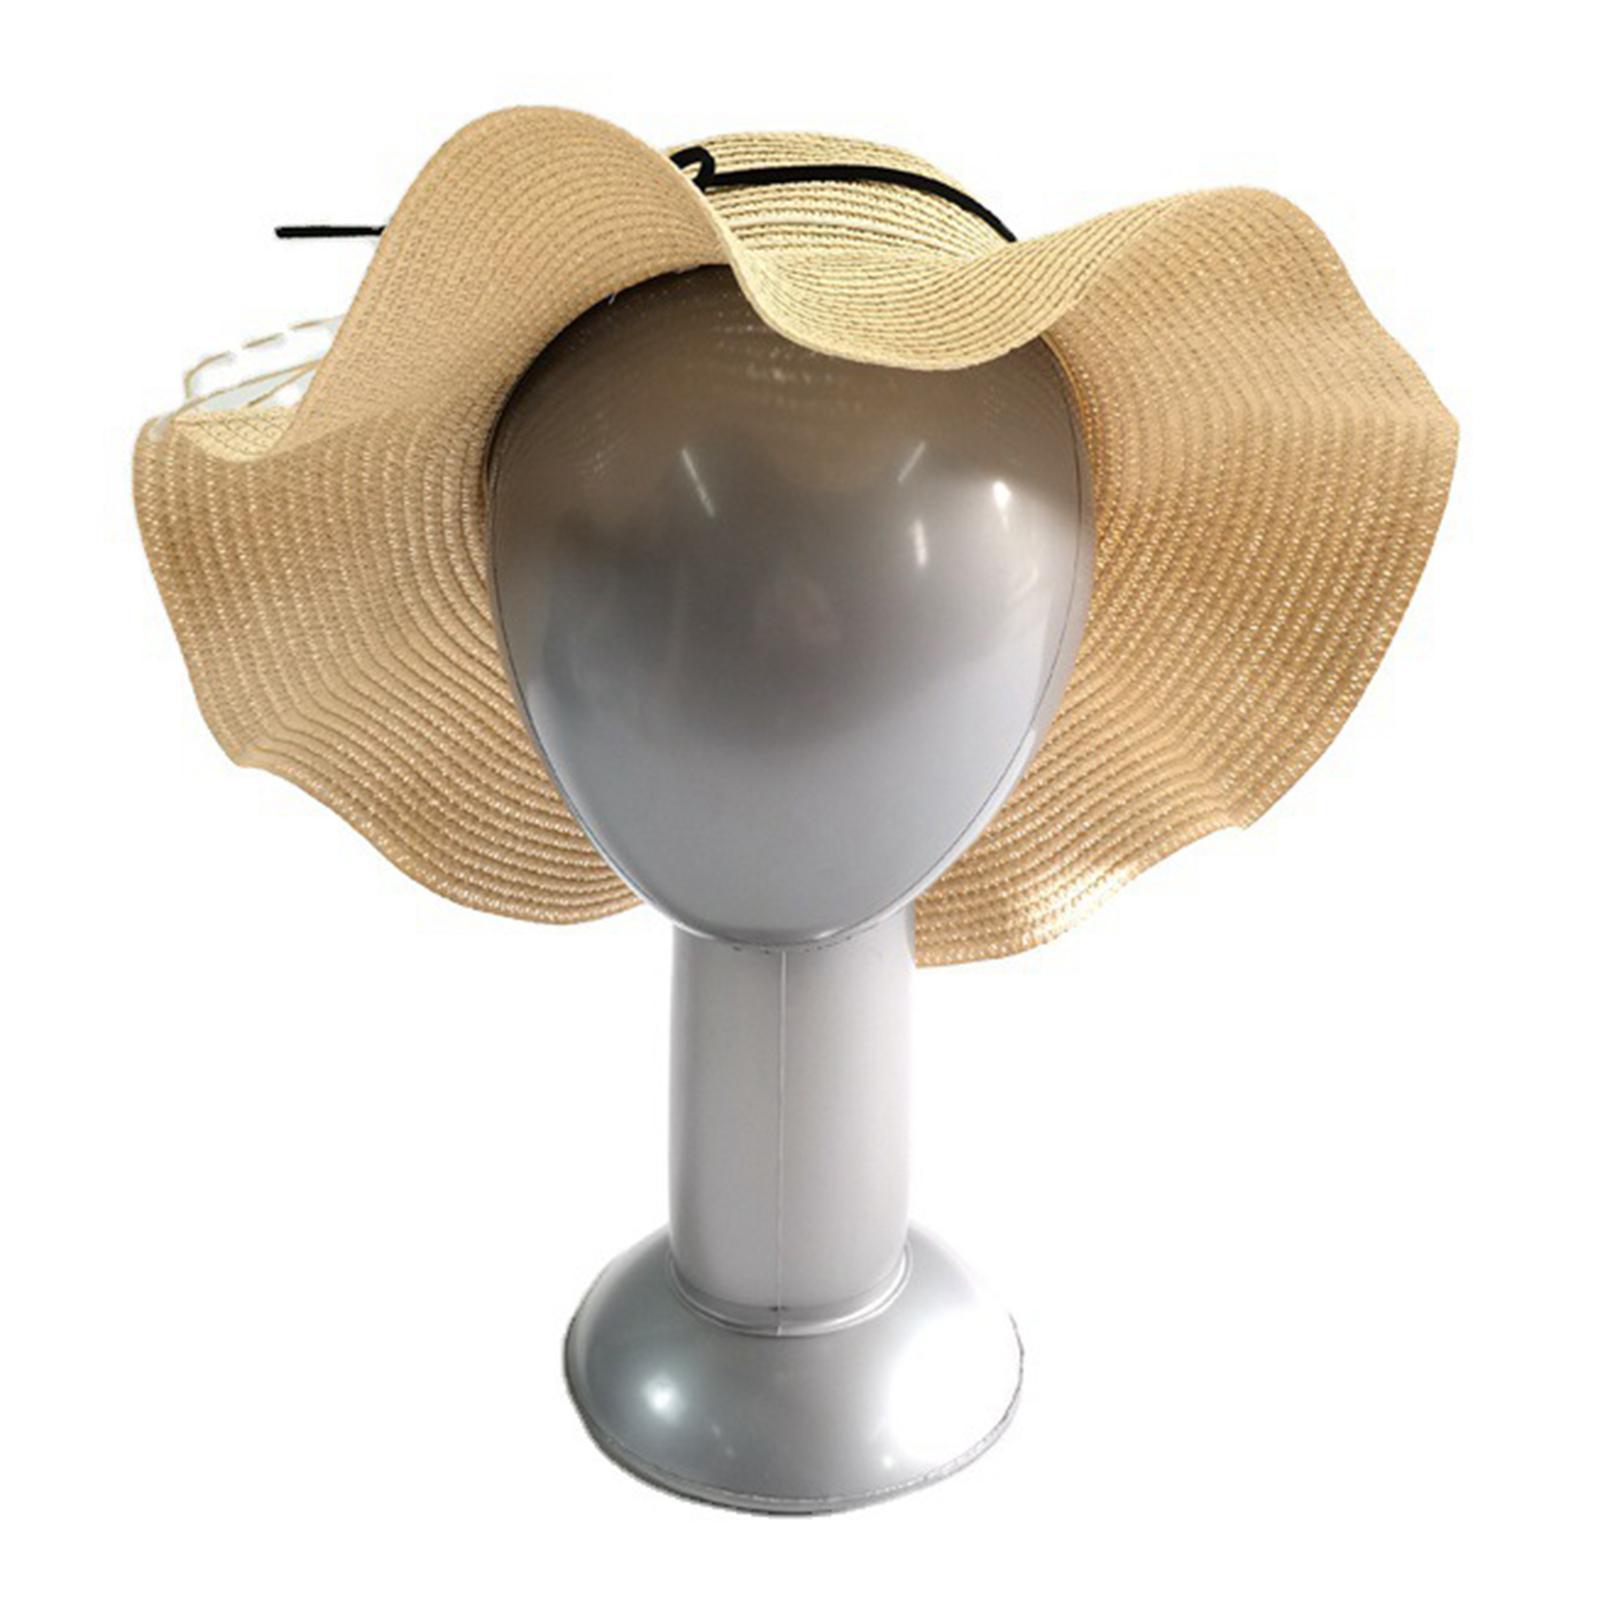 thumbnail 4 - PVC Mannequin Head Manikin Display Wigs Hats Jewelry Shop Window Salon